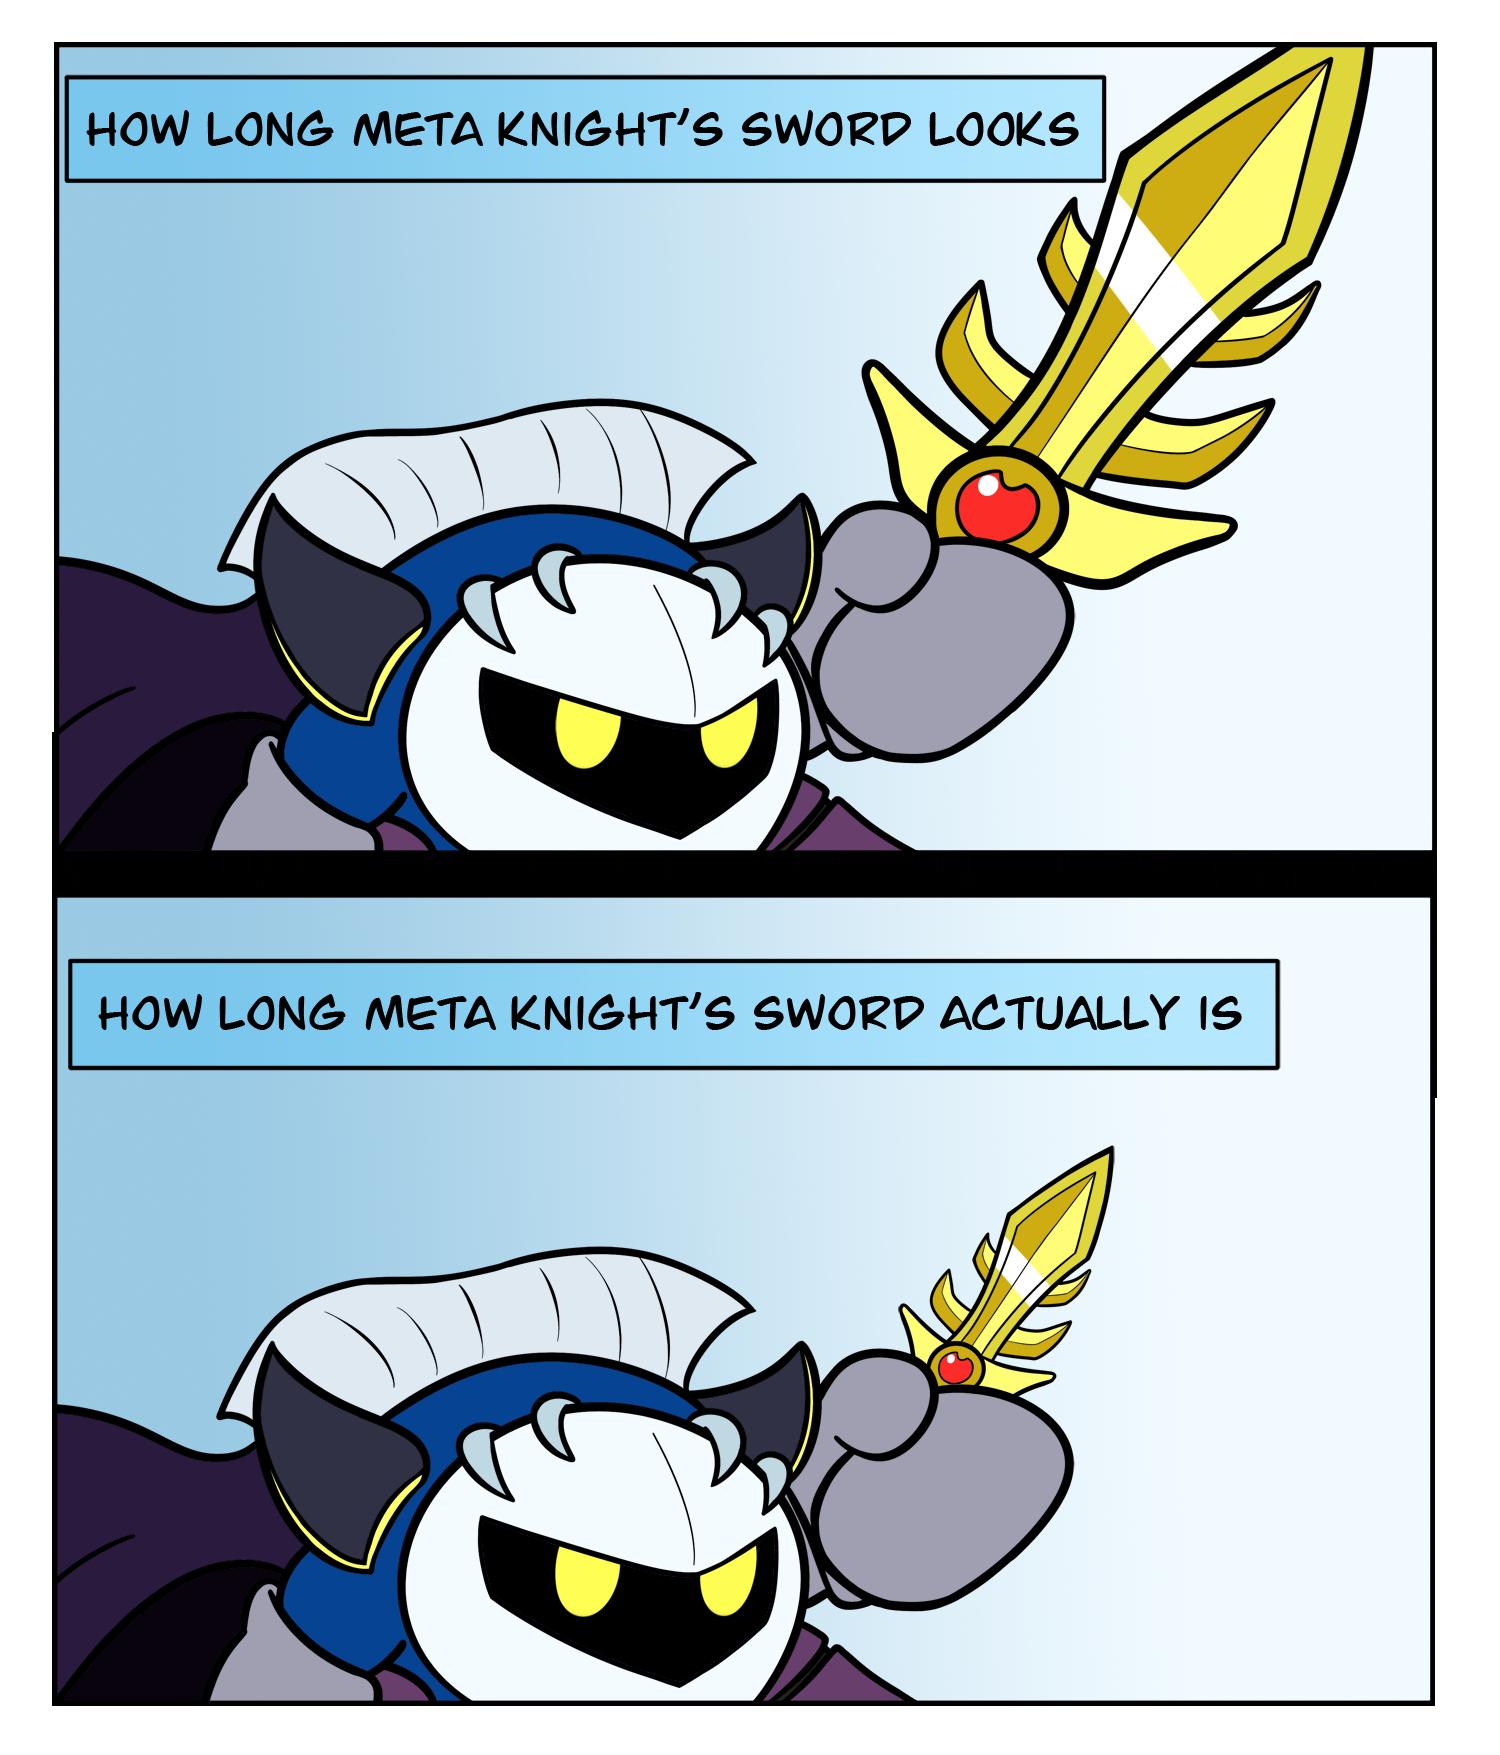 Smash Comic - Hitboxes 101 by Ryusuta on DeviantArt